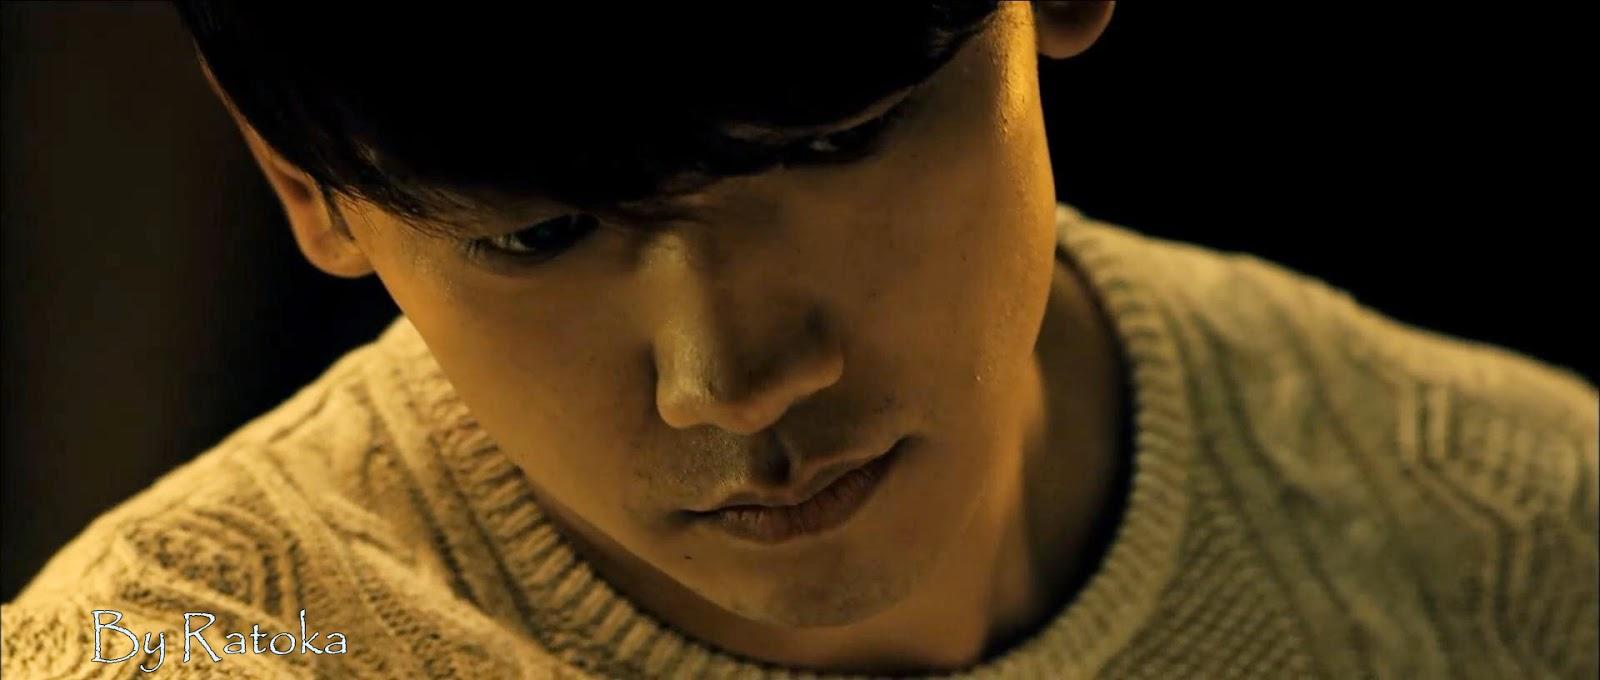 http://1.bp.blogspot.com/-_YdbuJ-dH_Y/VJ-f3eyD_MI/AAAAAAAAylA/WMmX0UEagYk/s1600/320.jpg